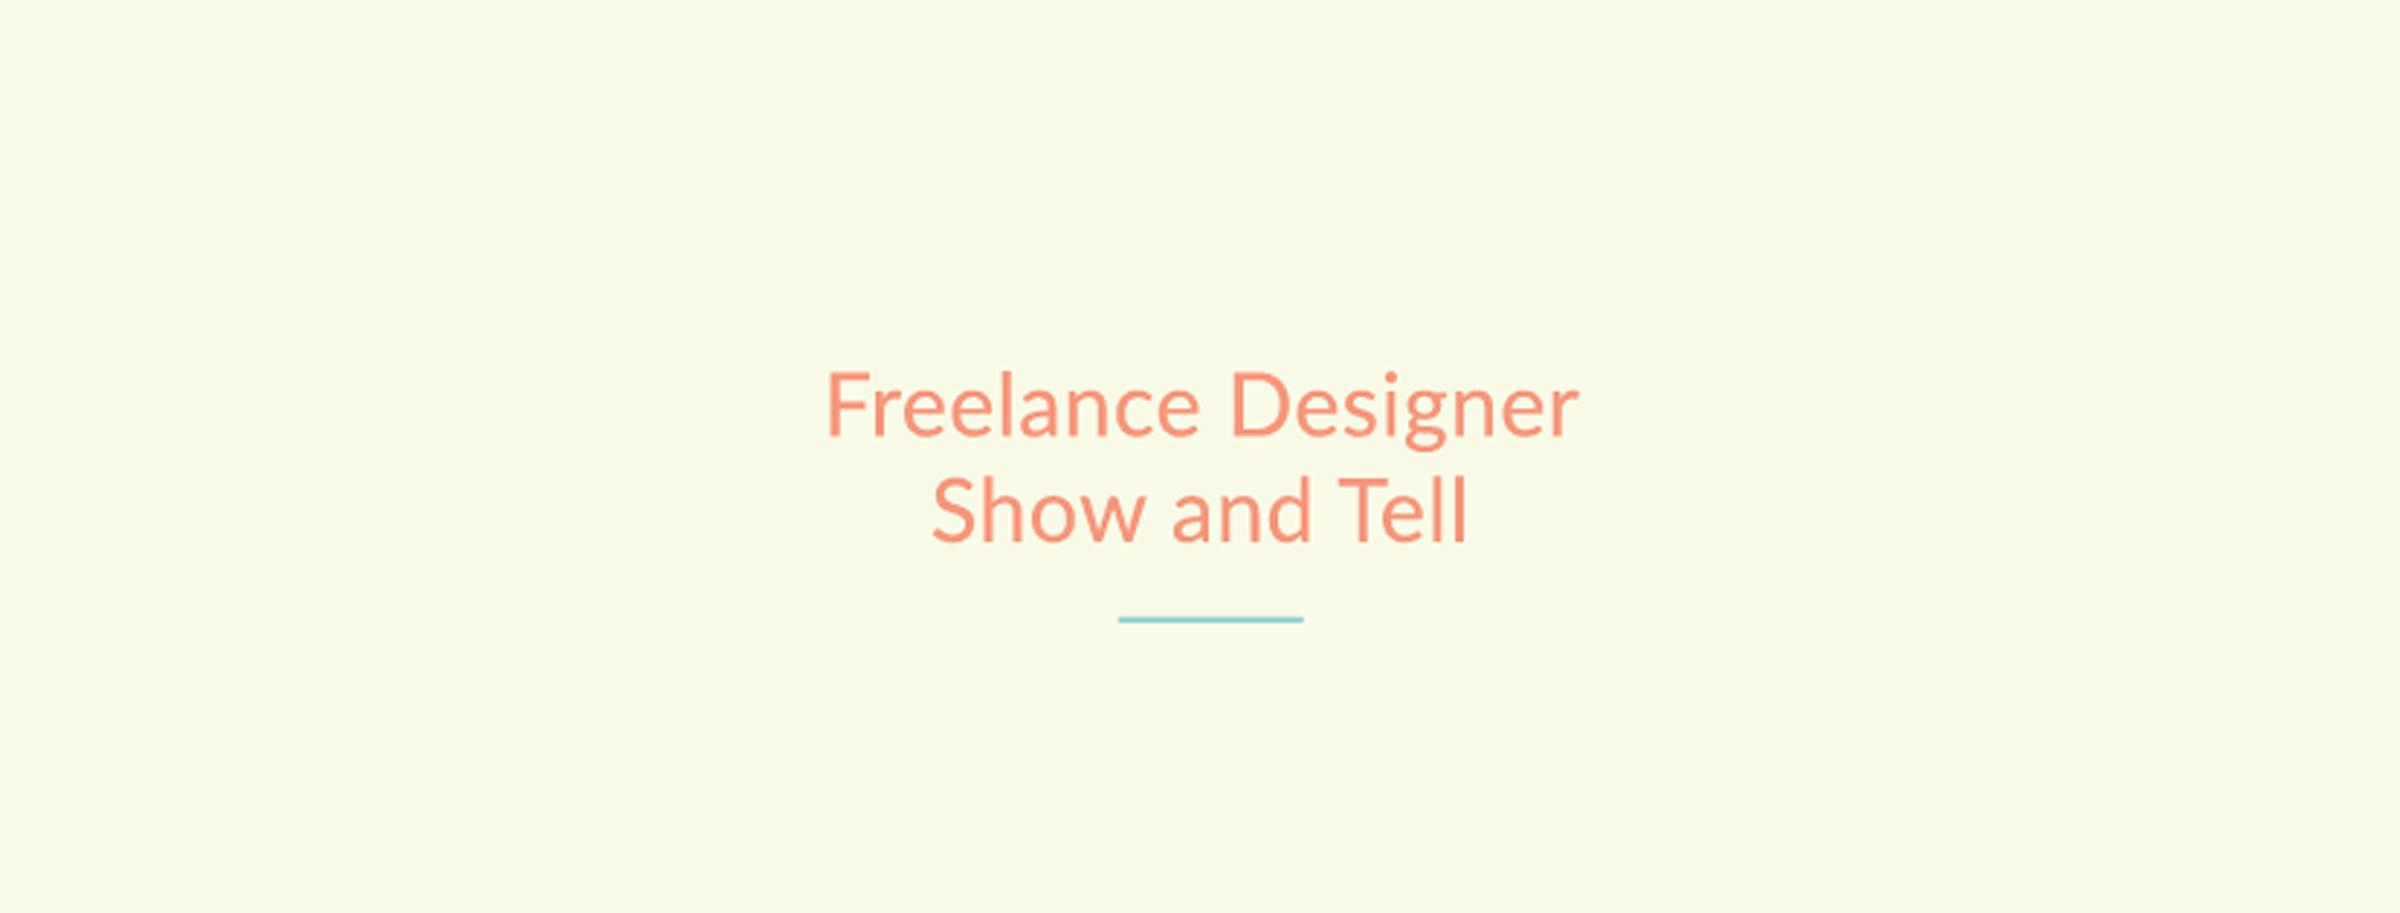 Freelance Designer Show and Tell